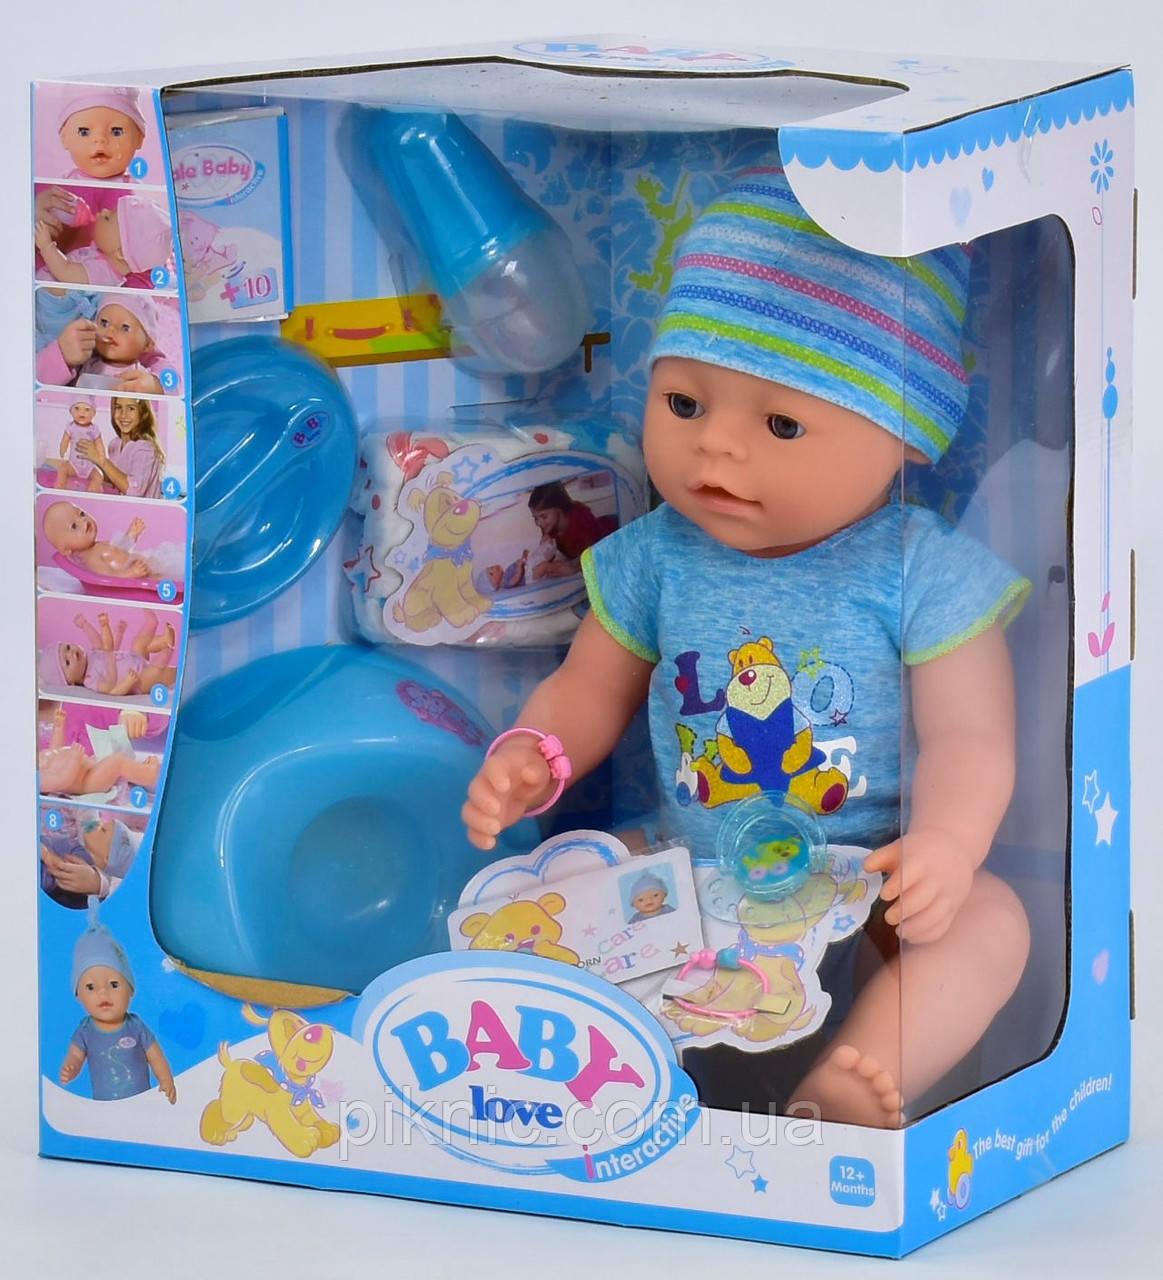 Пупс Baby Love аналог Baby born для девочки с аксессуарами. Пупсик, кукла, куколка, игрушка, игровой набор